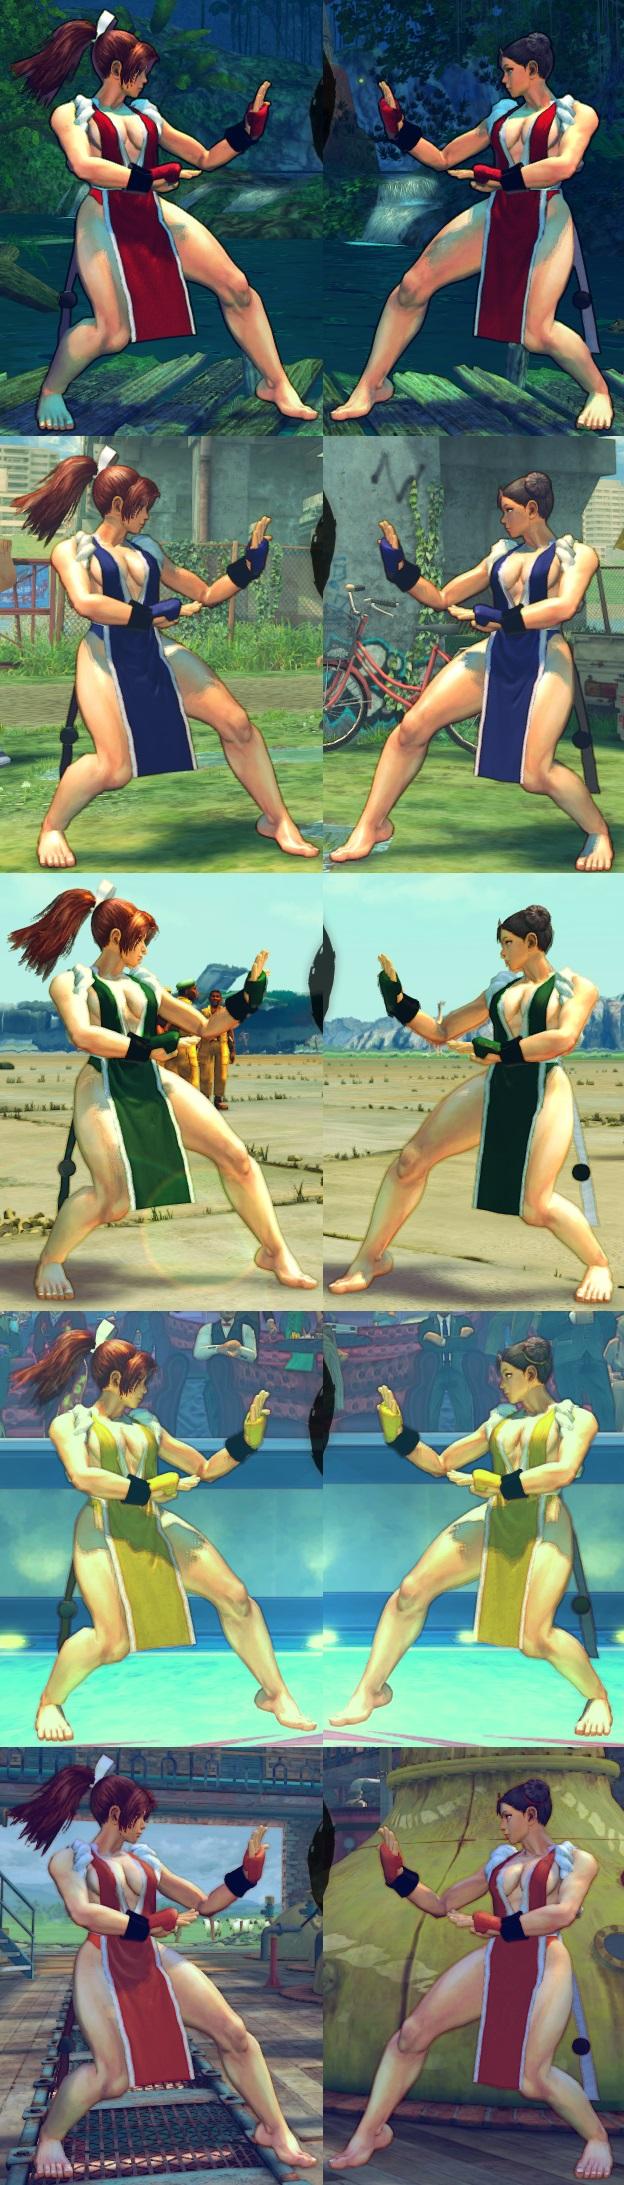 usf4_mod___chun_li__mai_shiranui_cosplay__feet__by_segadordelinks-d4statq.jpg